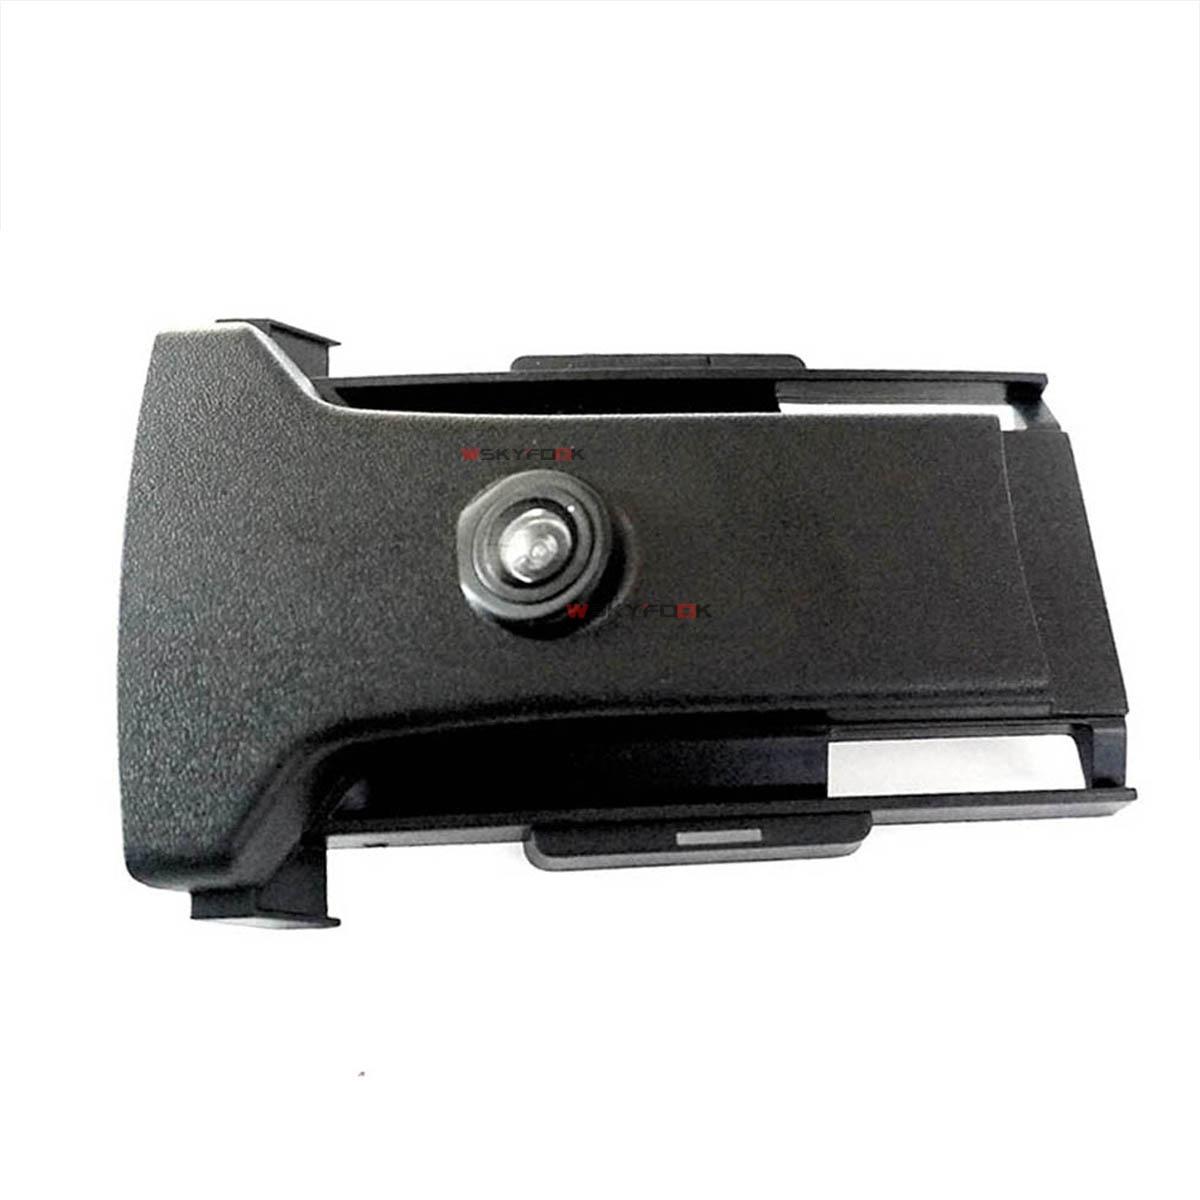 Night Vision 520L CCD Car Front View Camera For TOYOTA Prado Car Front Web Camera Waterproof Paking Kit